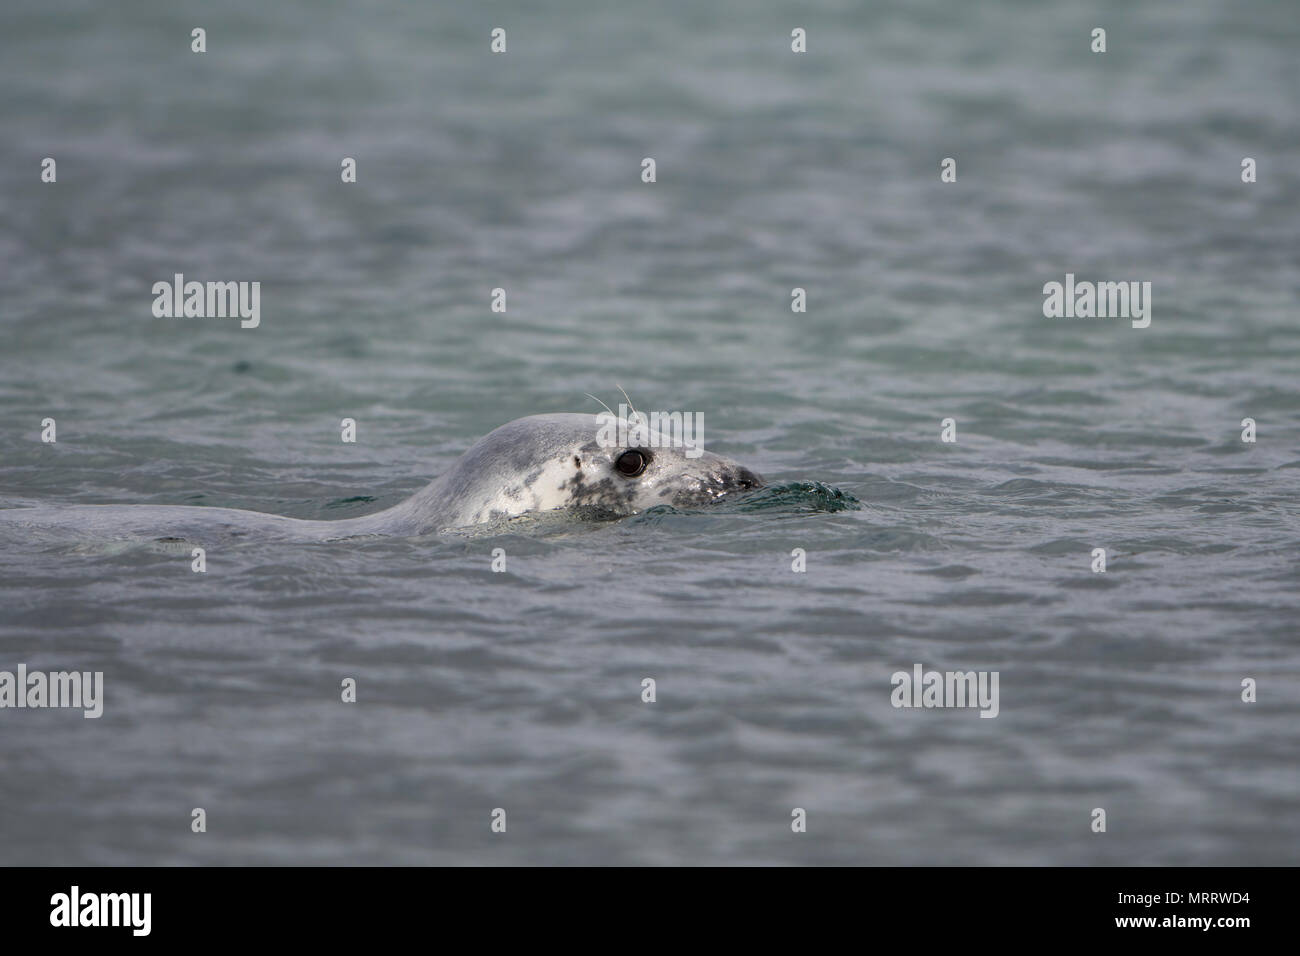 A inquisitve Grey Seal (Halichoerus grypus) swimming on water surface, Loch Fleet, Sutherland, Scotland,UK - Stock Image